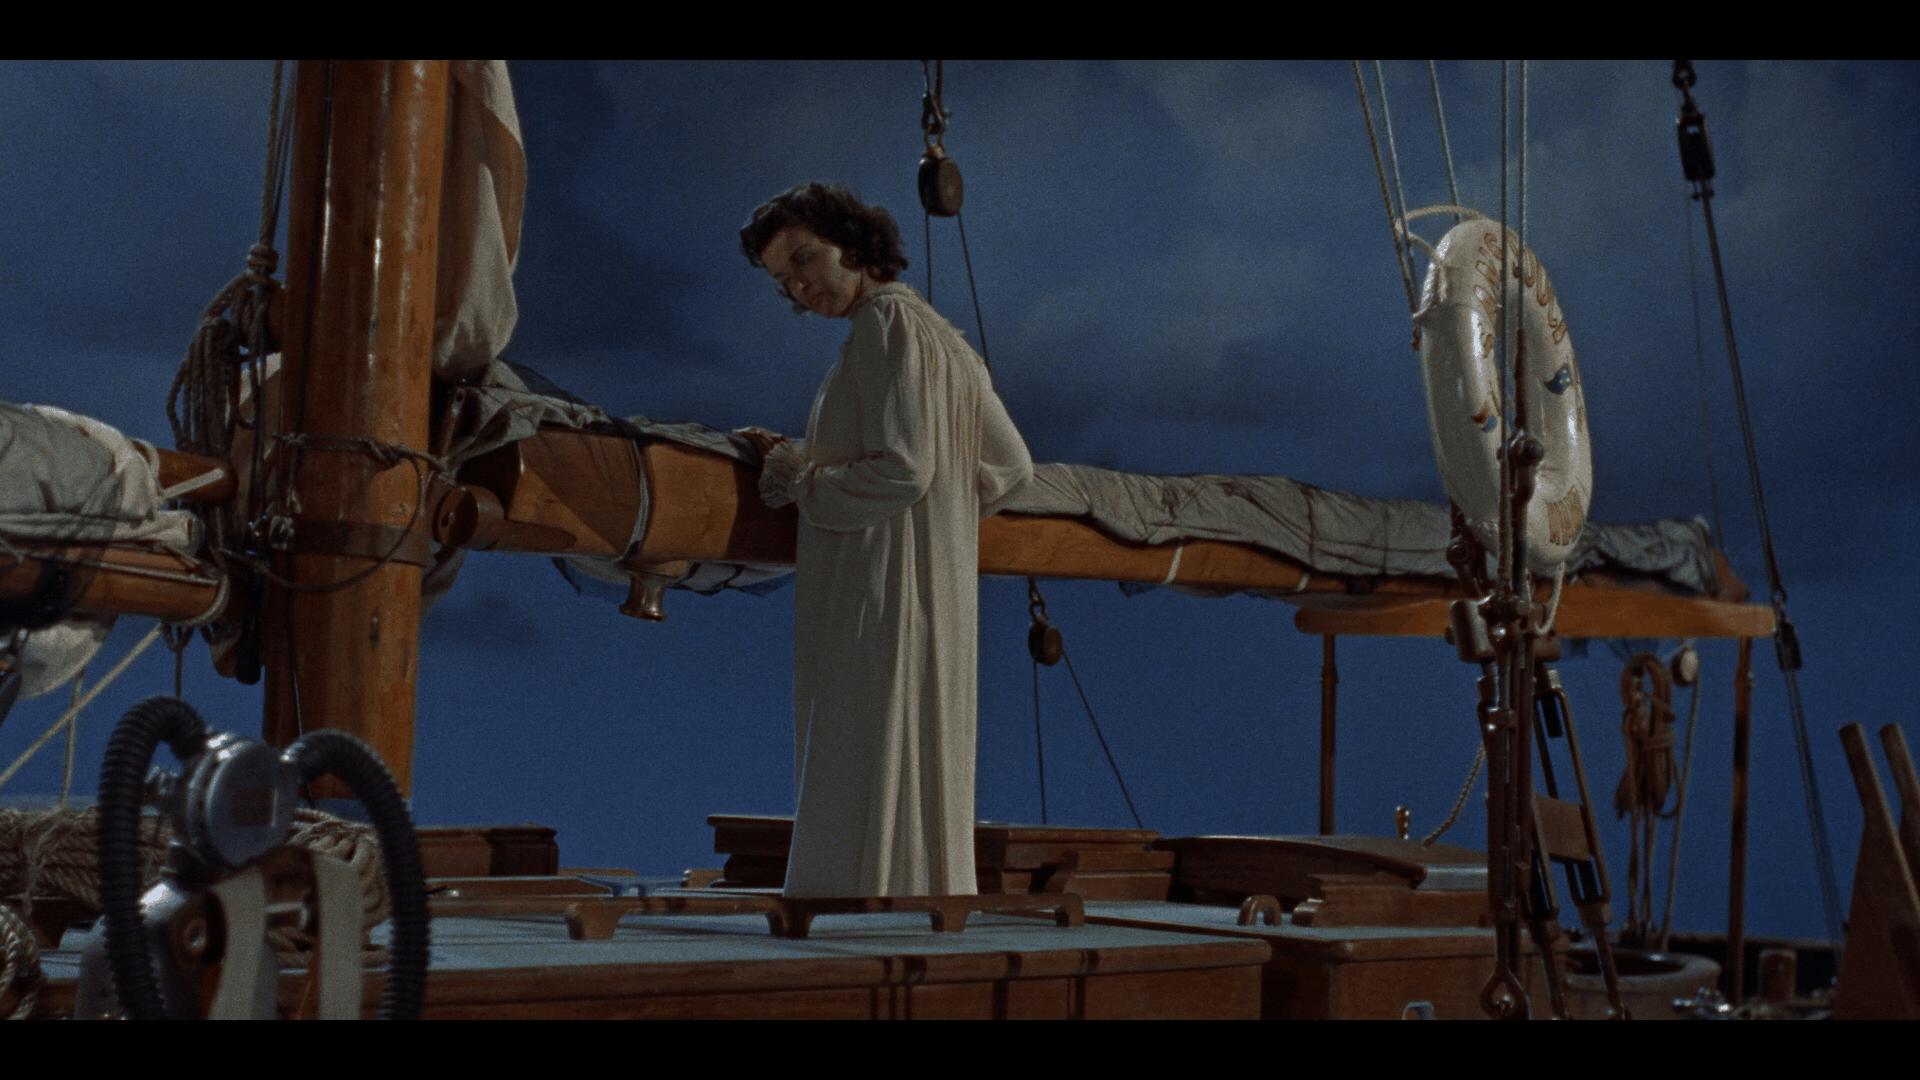 Underwater Warner Archive Blu-ray review